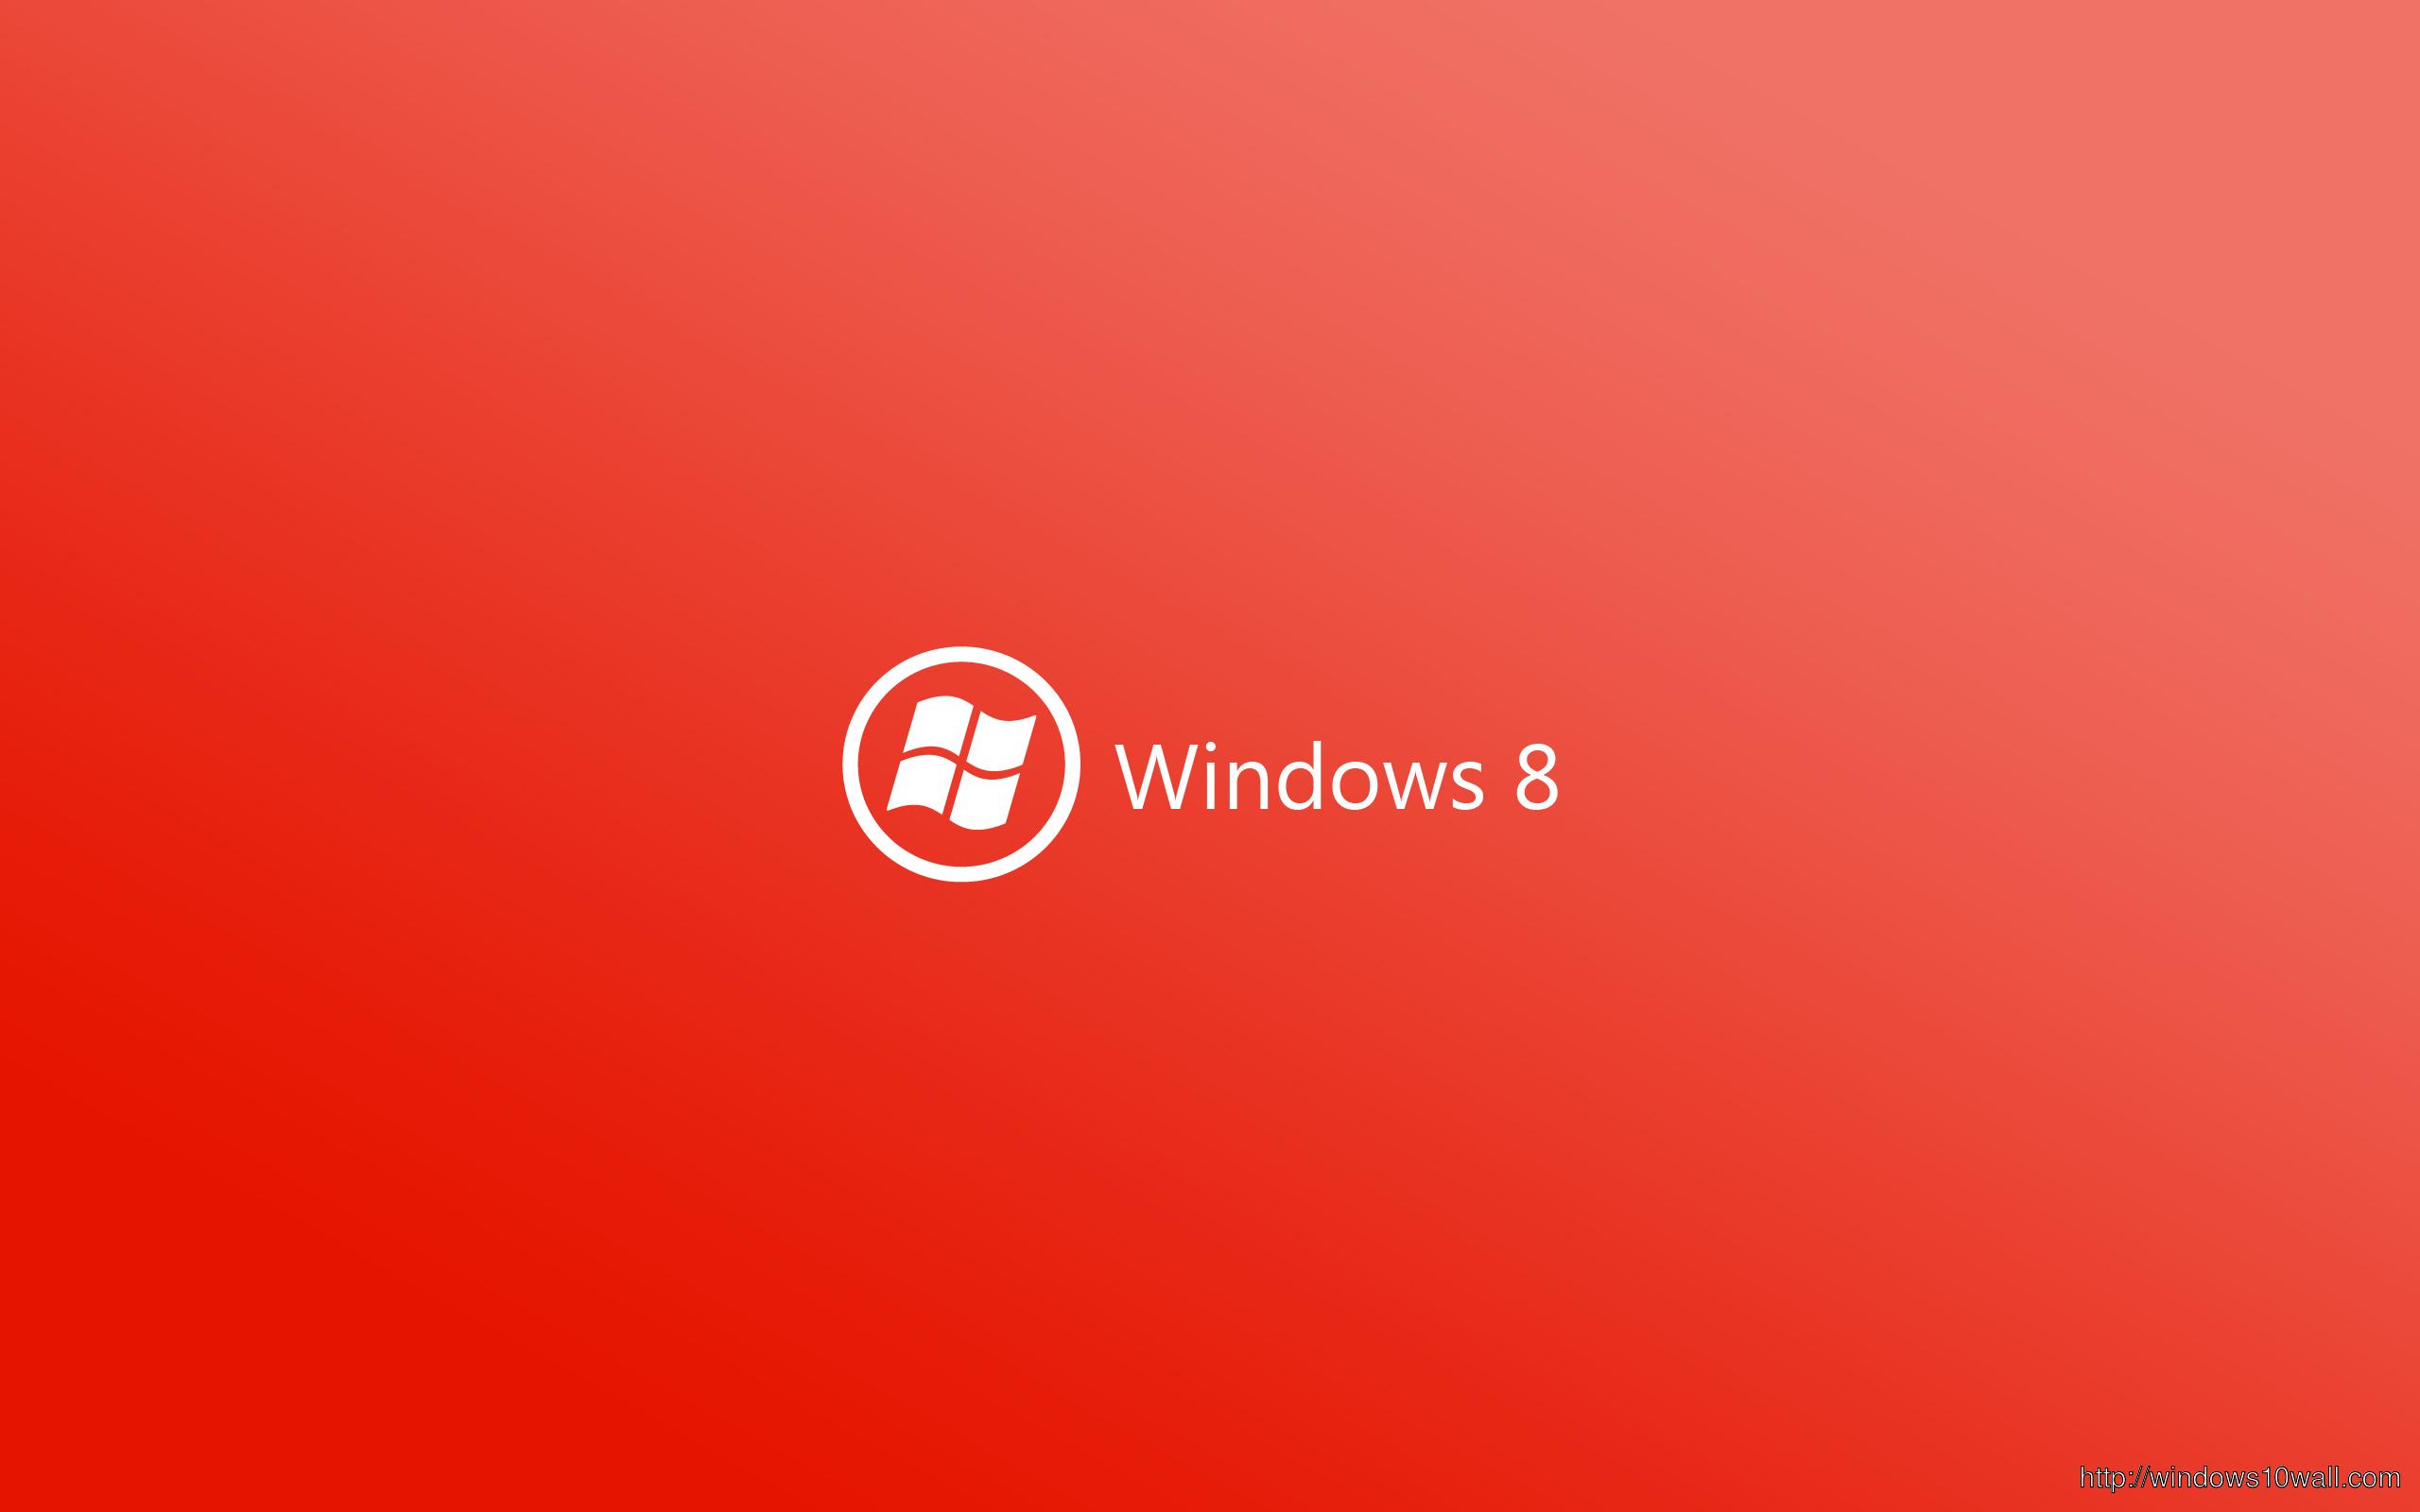 windows-8-wallpaper-red